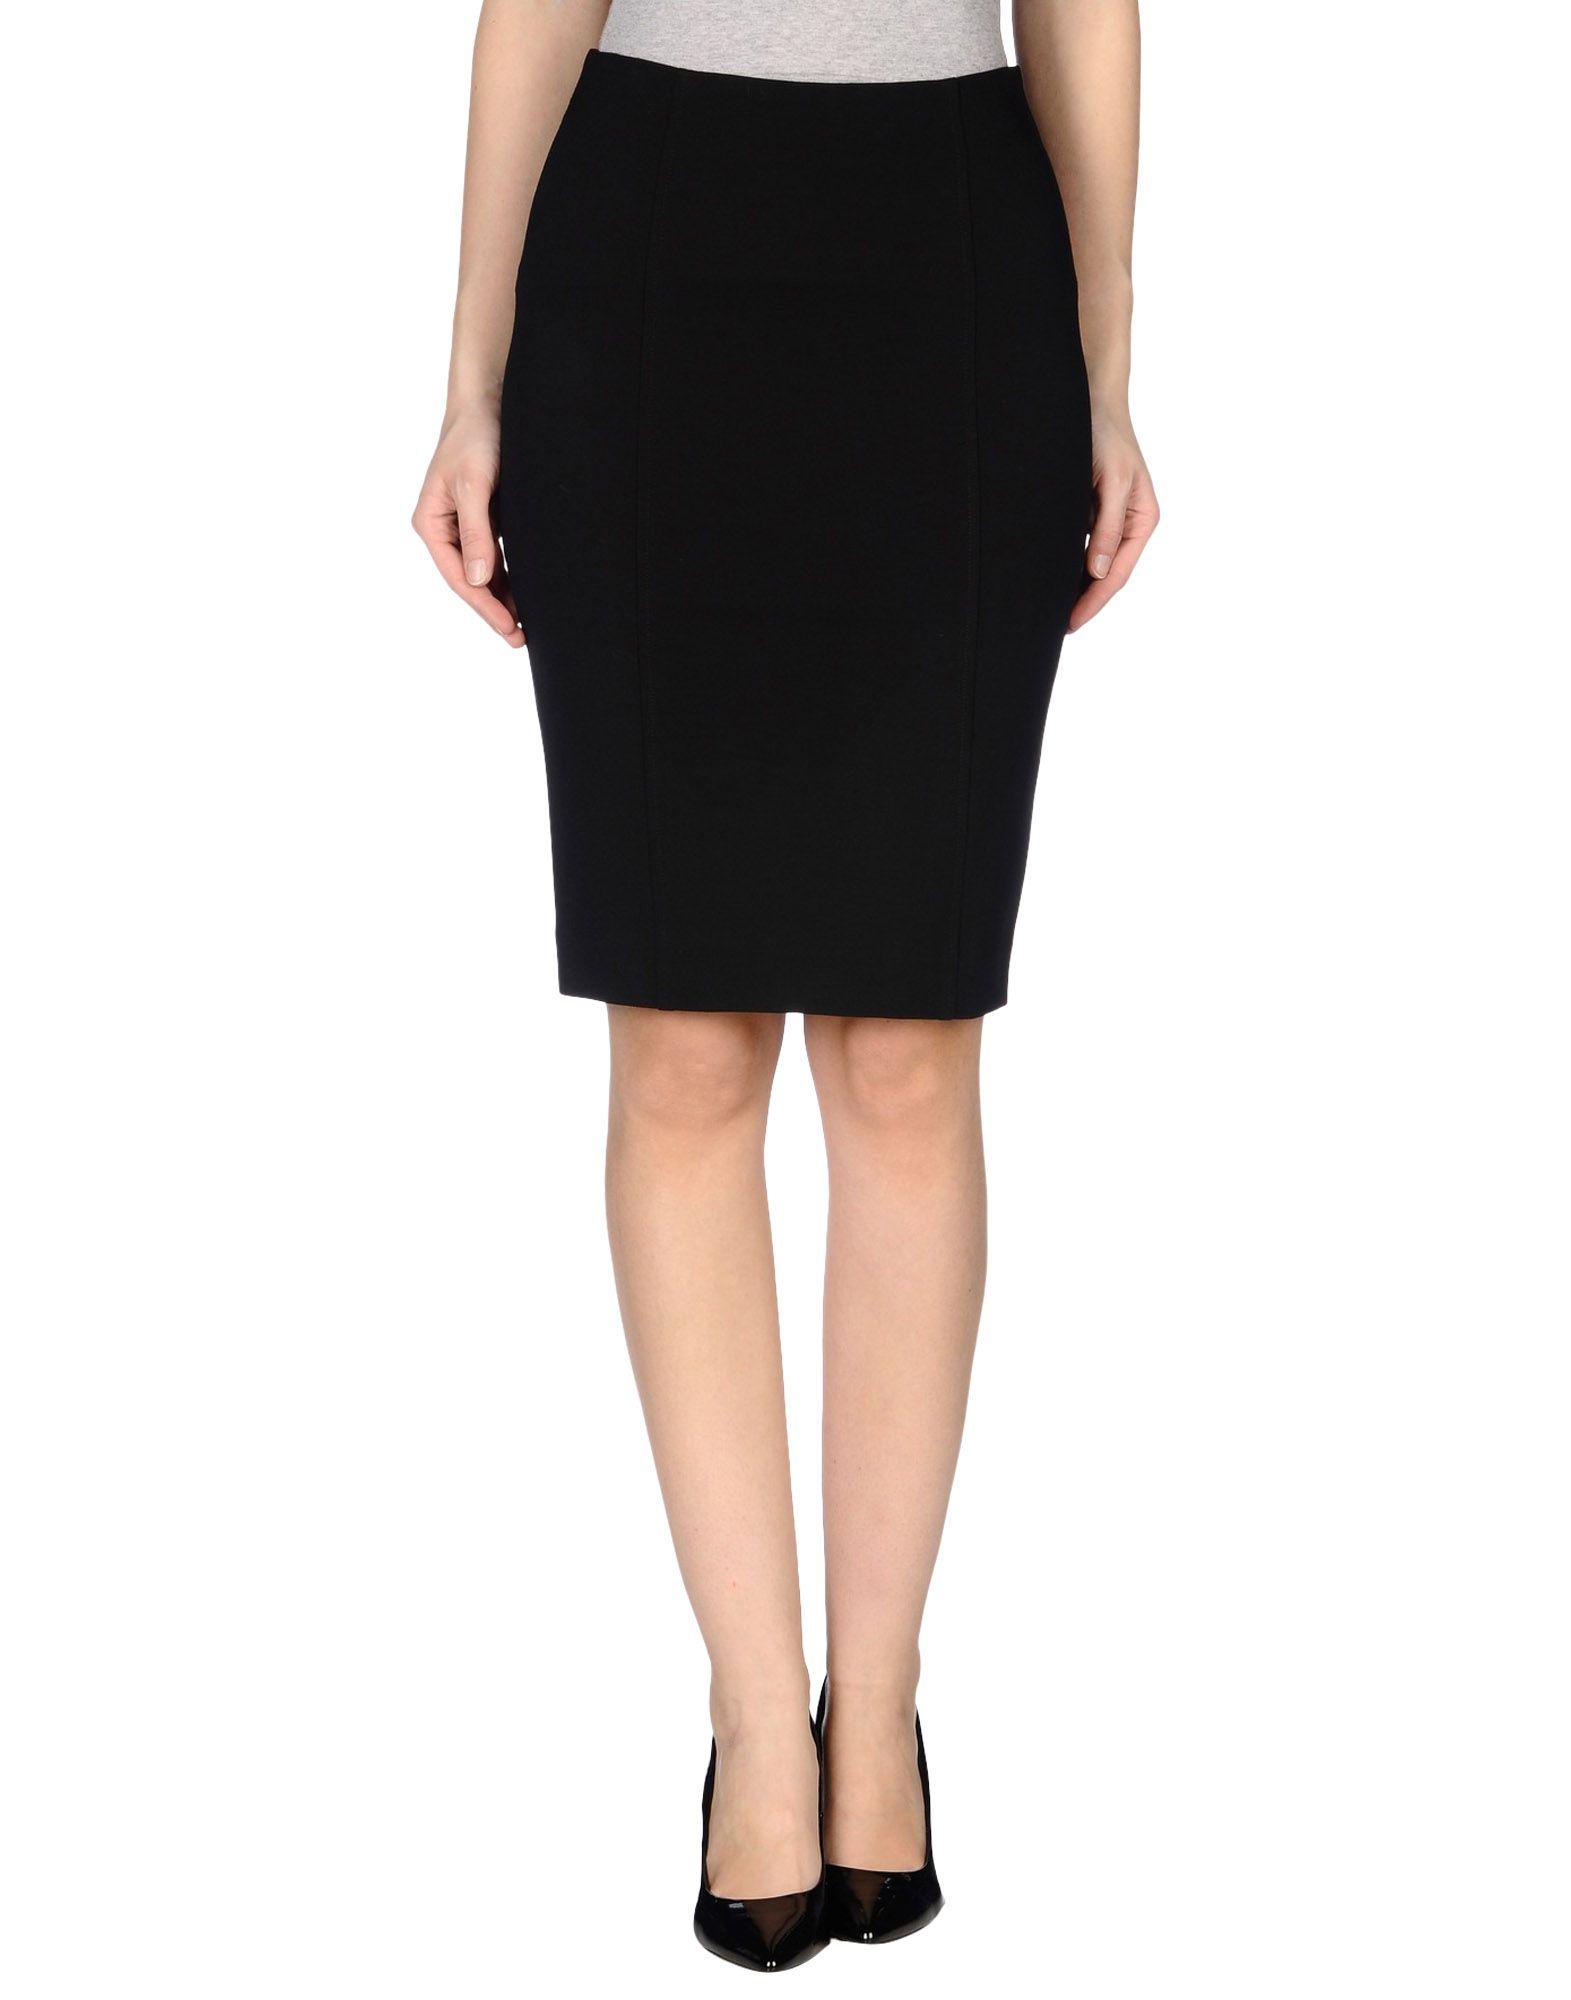 a biddikkia knee length skirt in black save 75 lyst